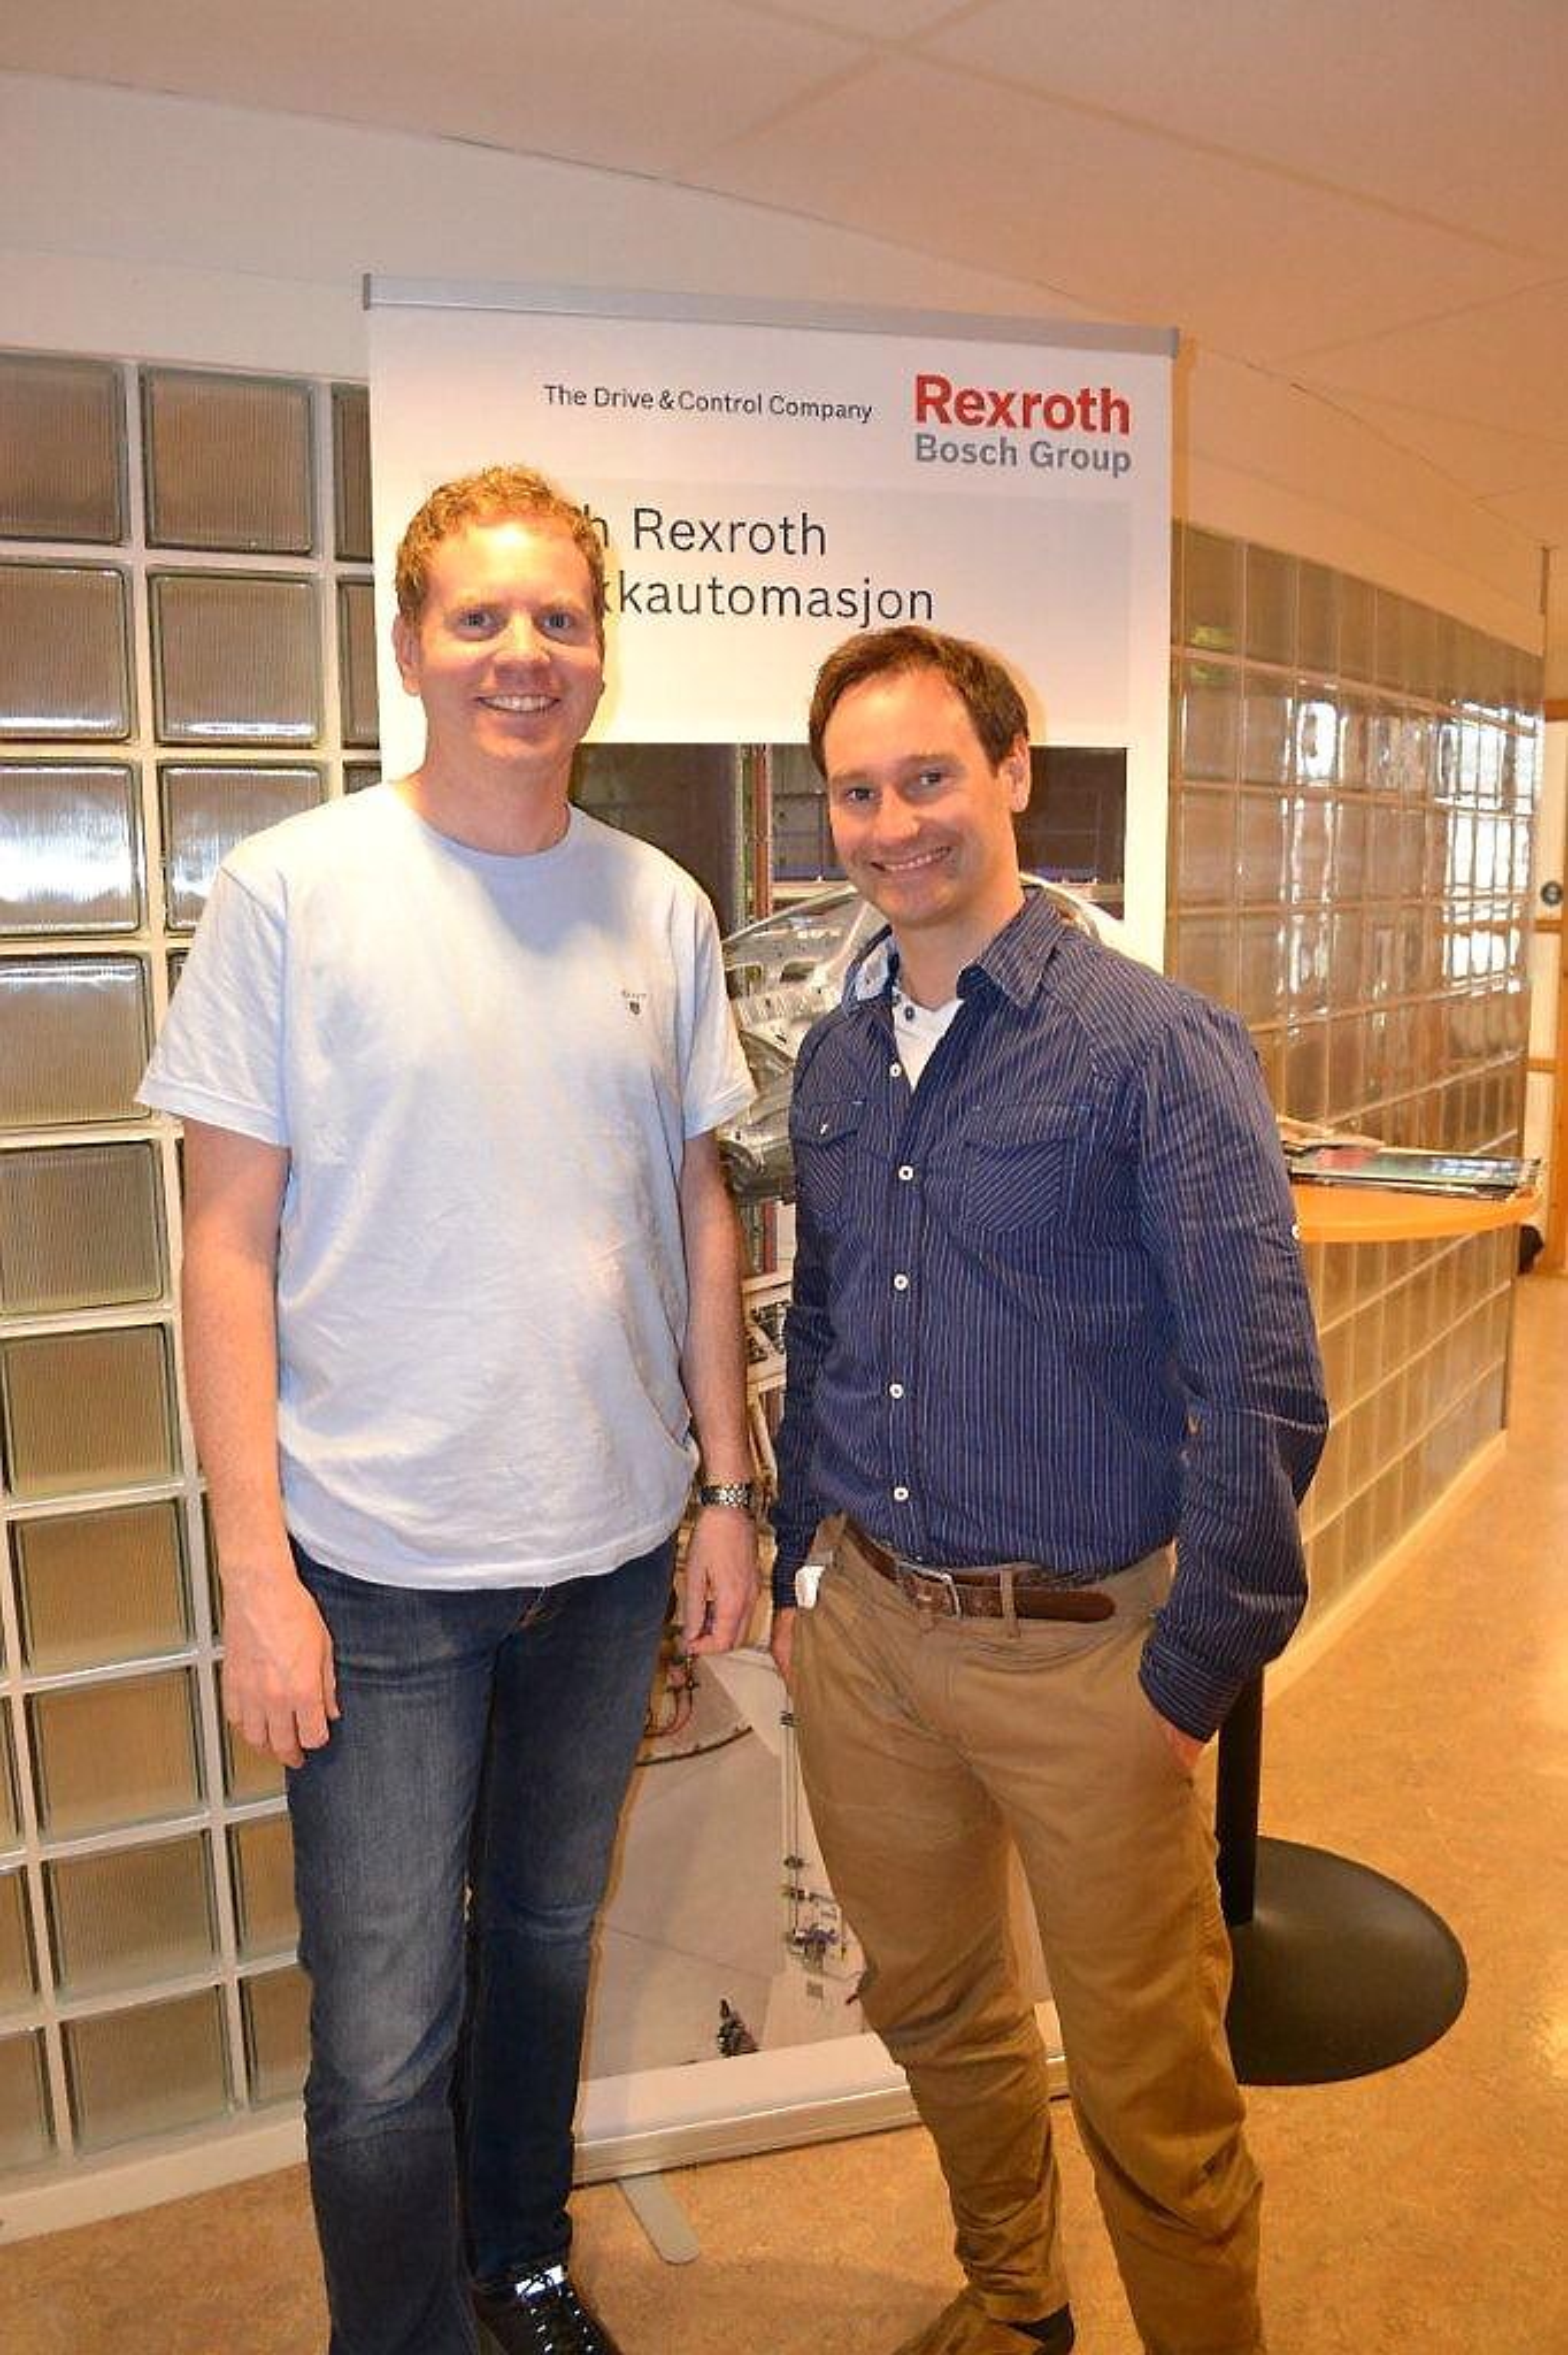 Roger Almaas (til venstre) og Tormod Eriksen har inntatt salgsteamet hos Bosch Rexroth.